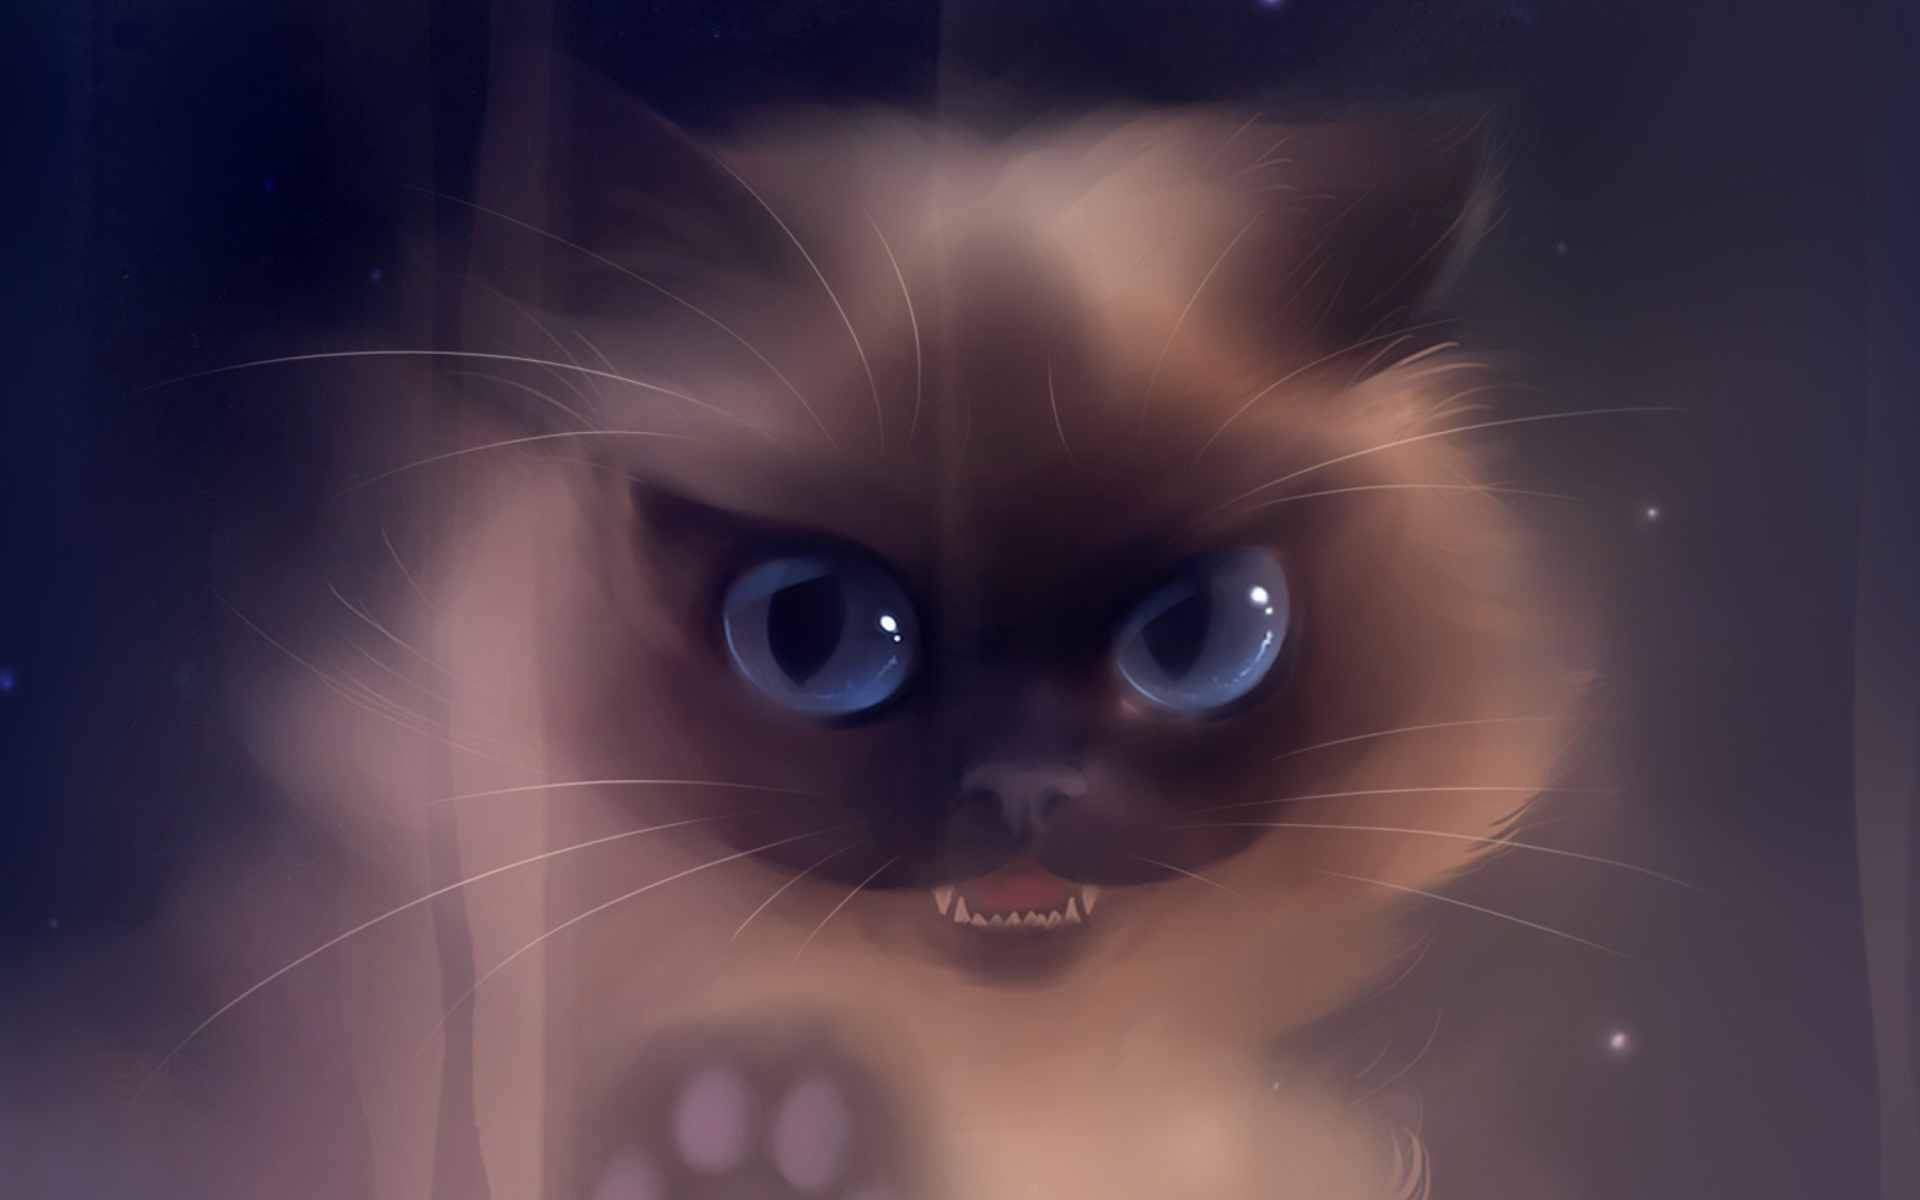 Bad kitty painting fondos de pantalla gratis para for Imagenes full hd para fondo de pantalla